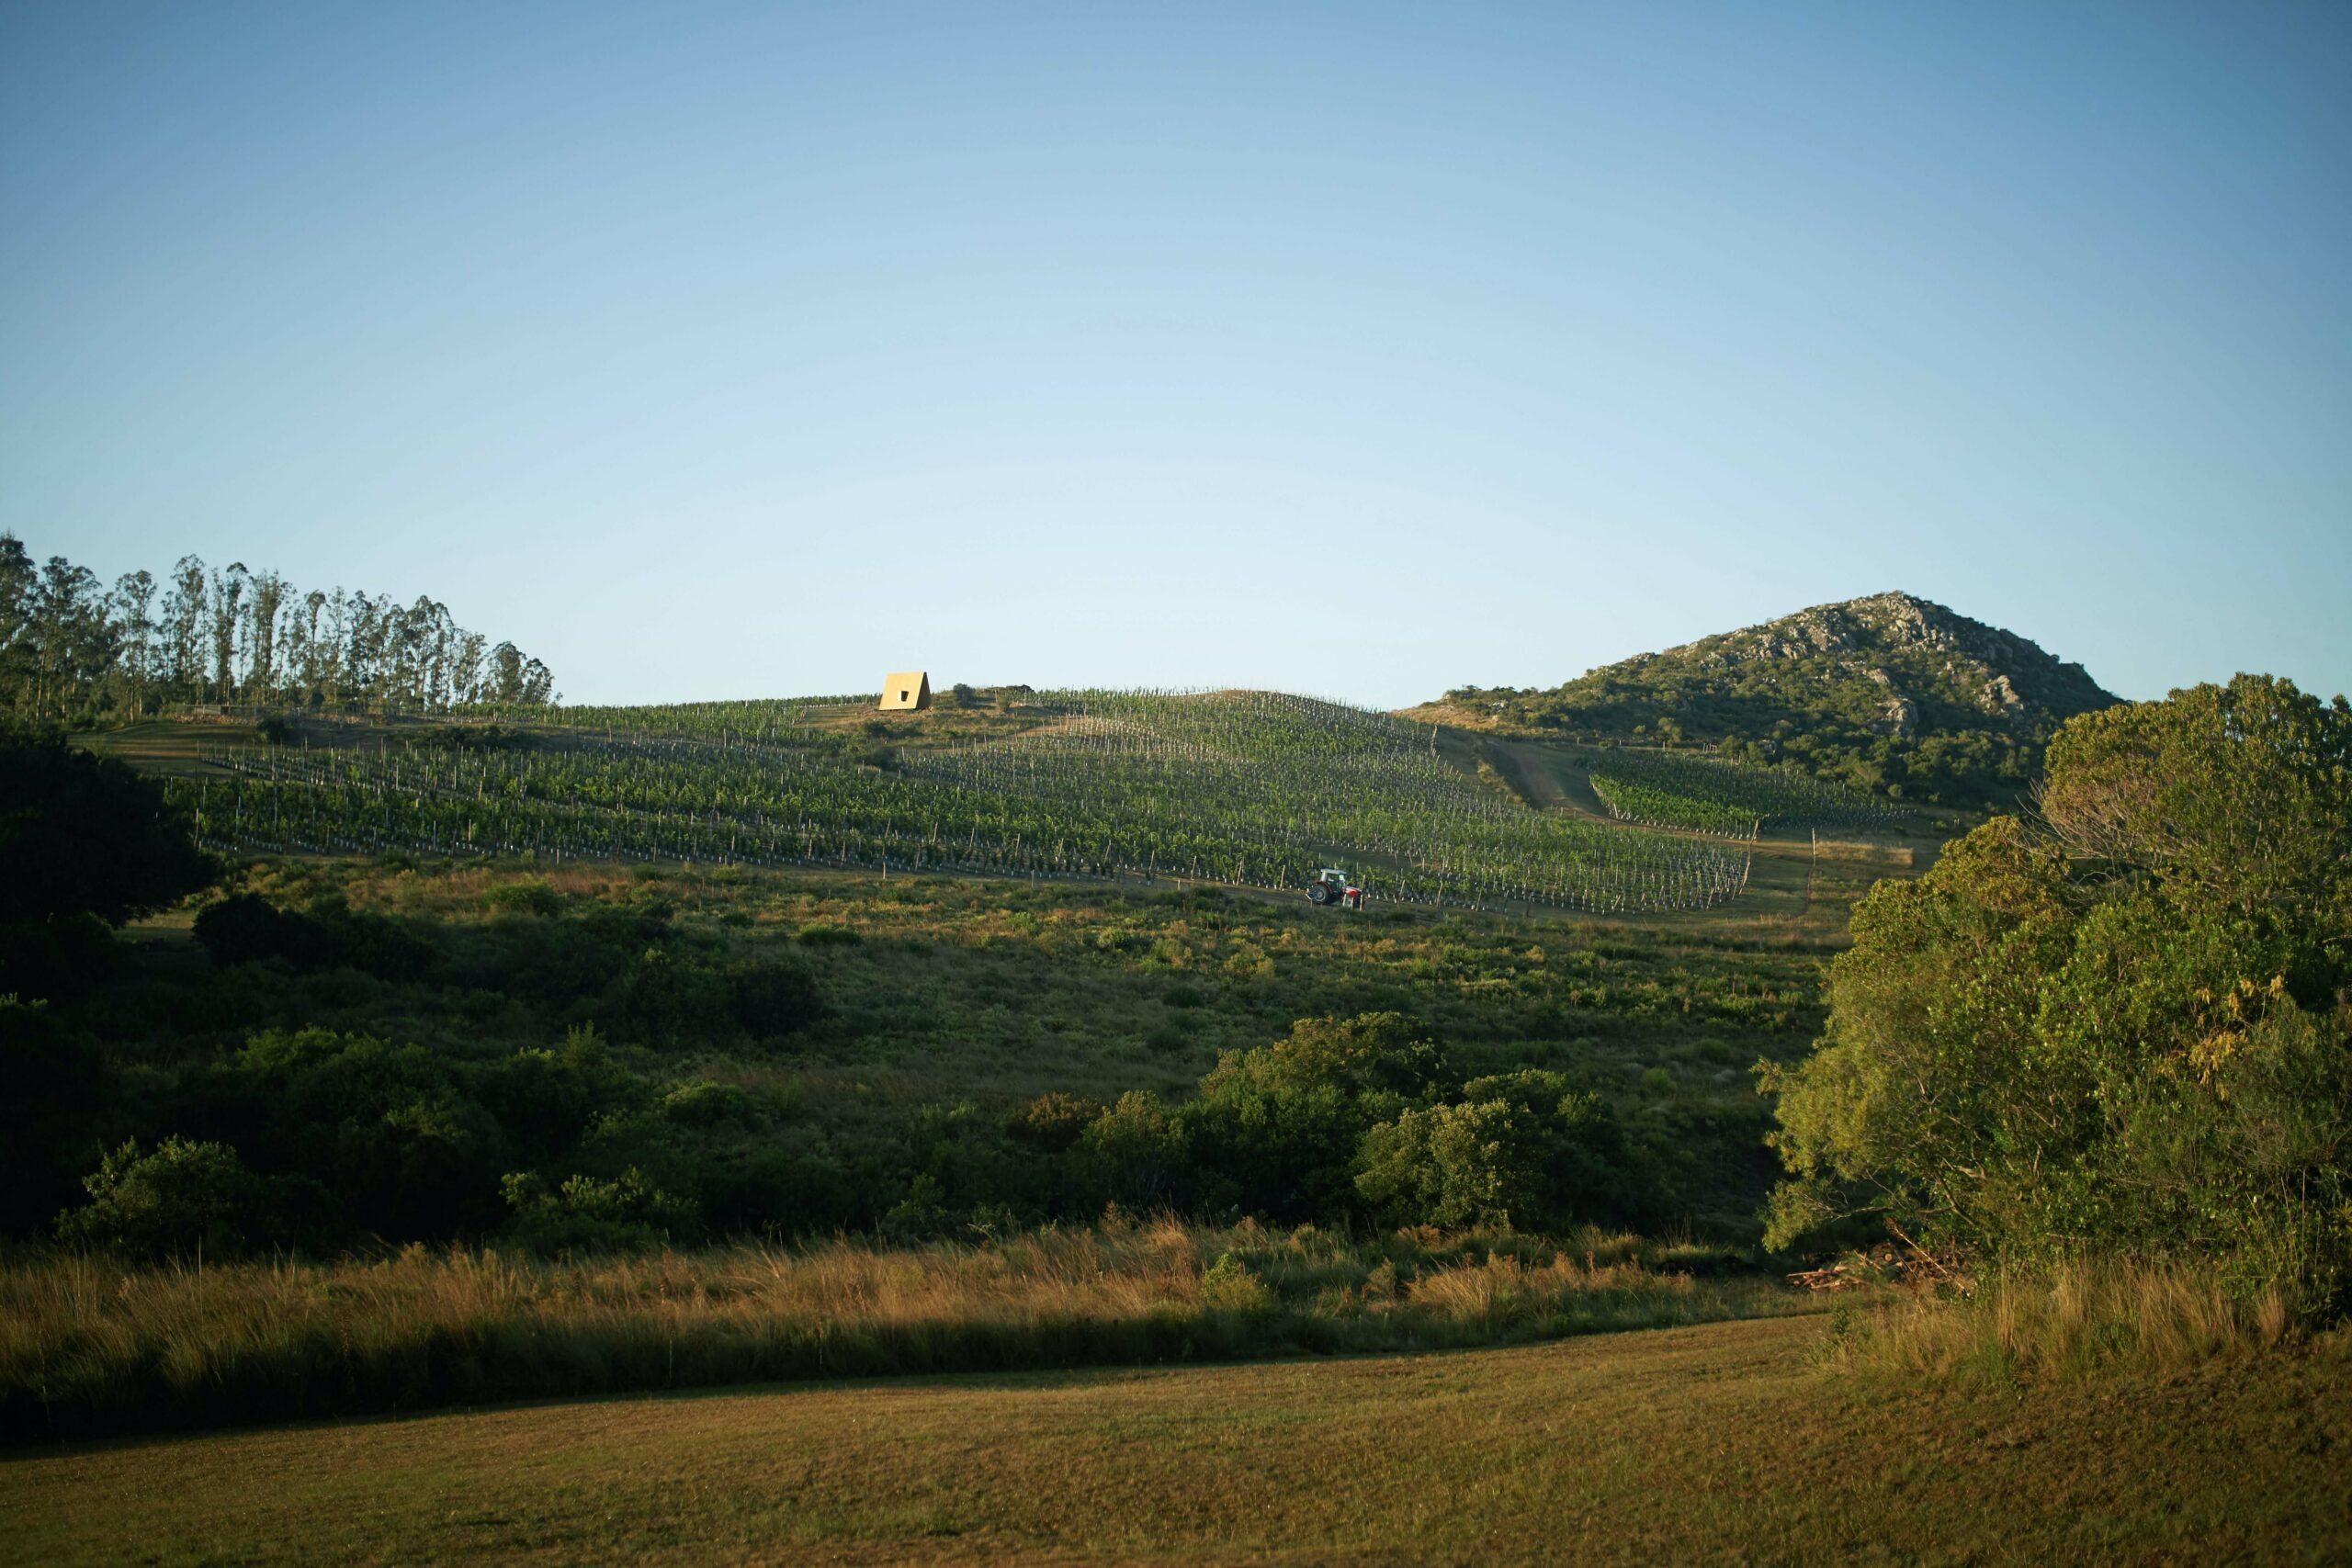 wine yards-sacromonte landscape hotel uruguay